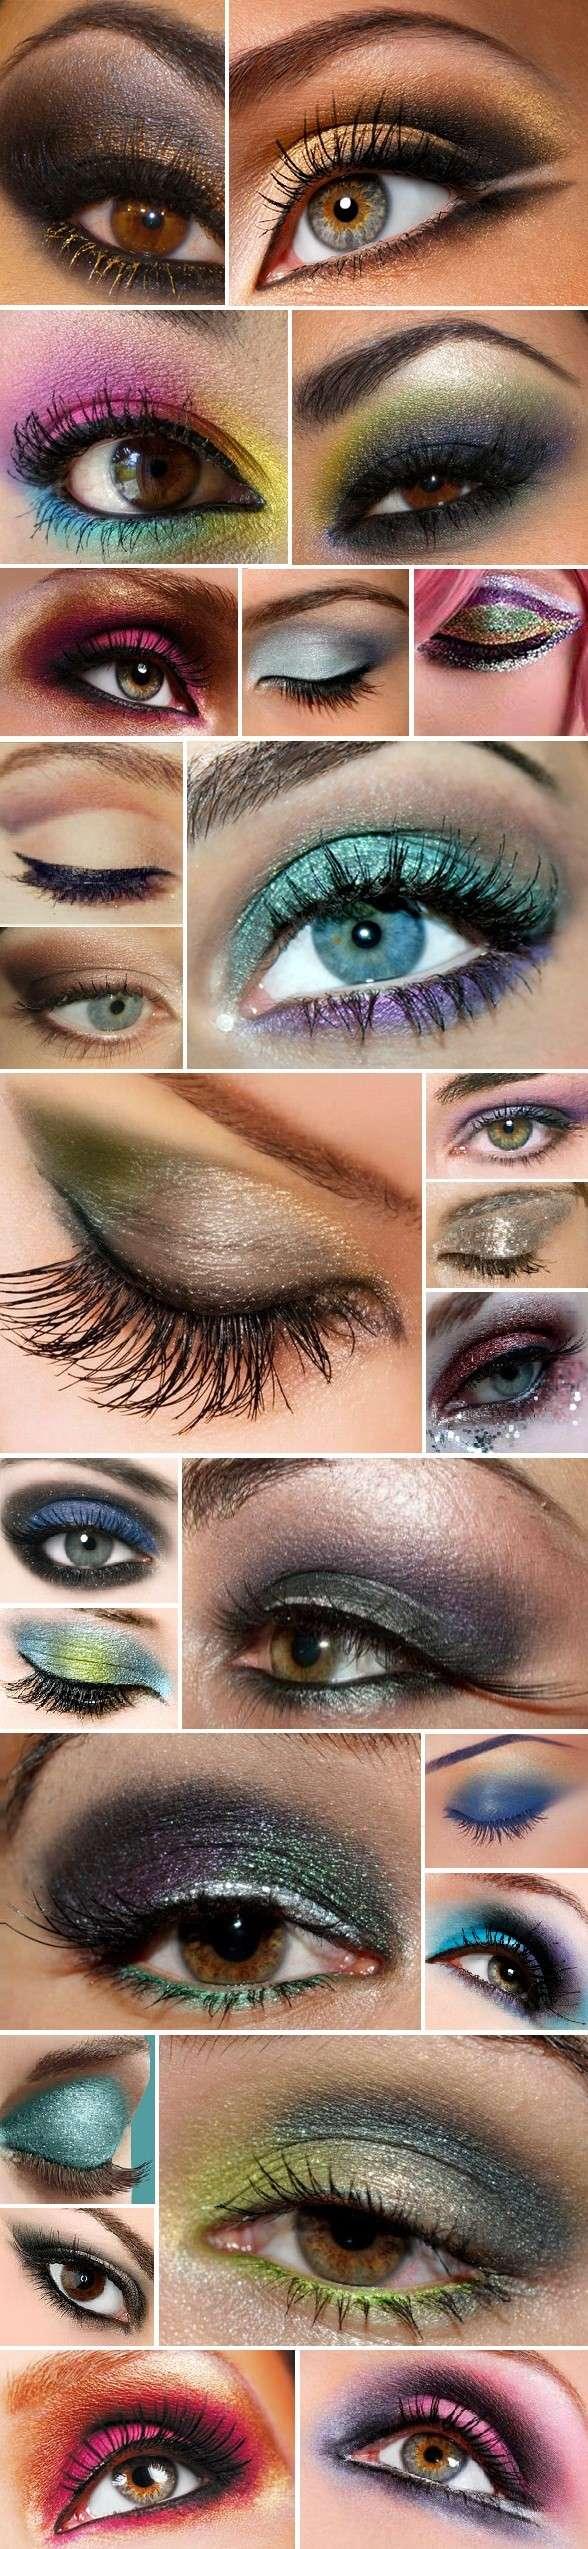 Galleria fotografica make up Occhi-10